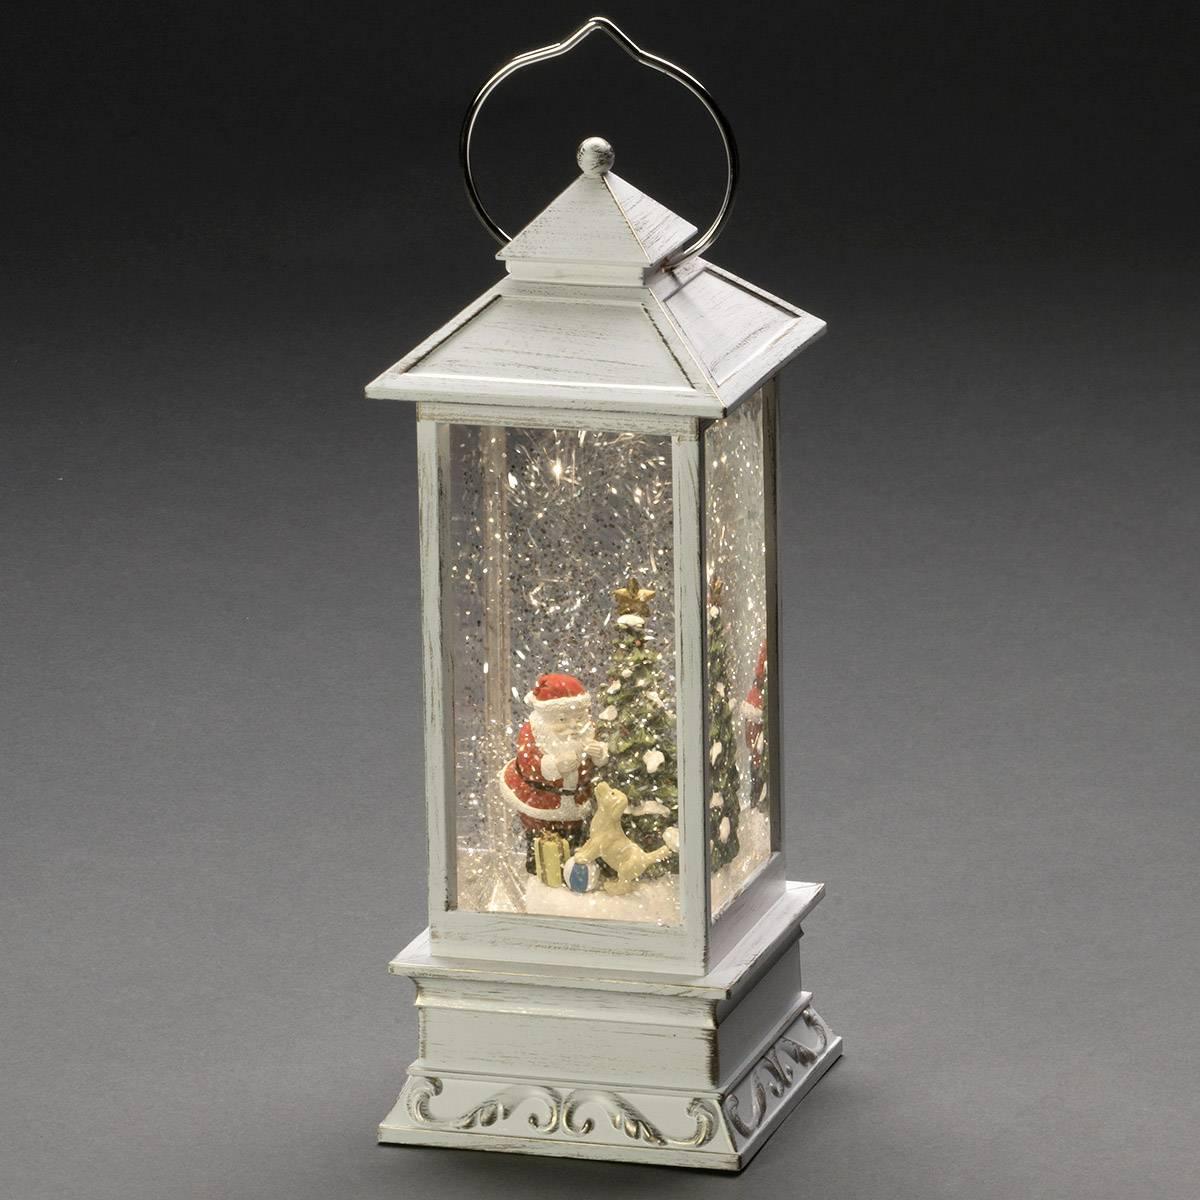 LED lucerna Santa Claus Konstsmide 4364-200, bílá